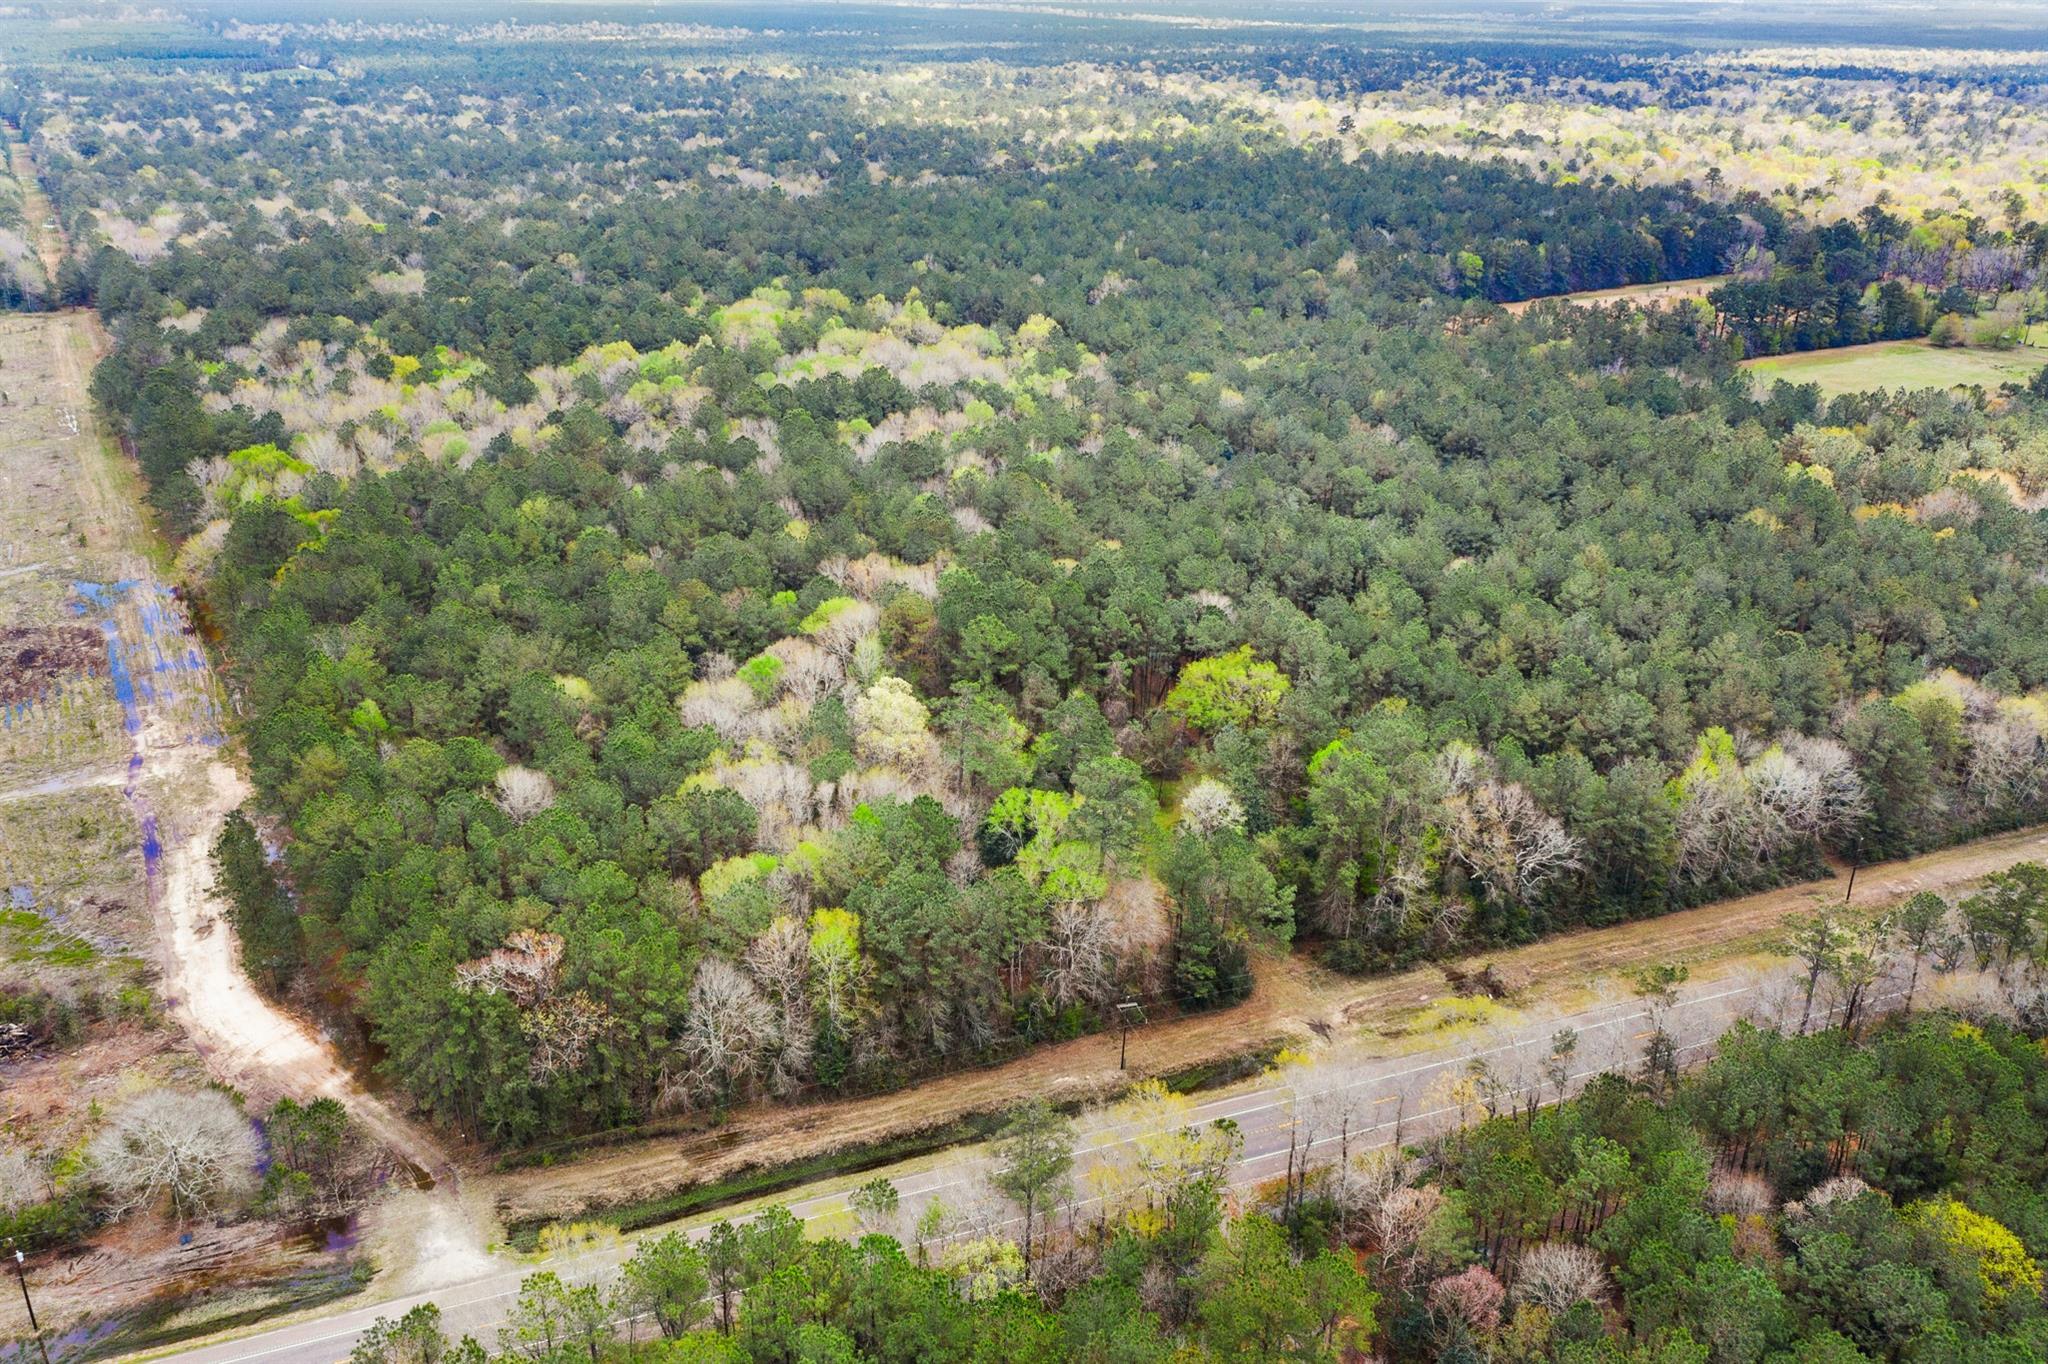 9155 N Hwy 326 Property Photo - Kountze, TX real estate listing